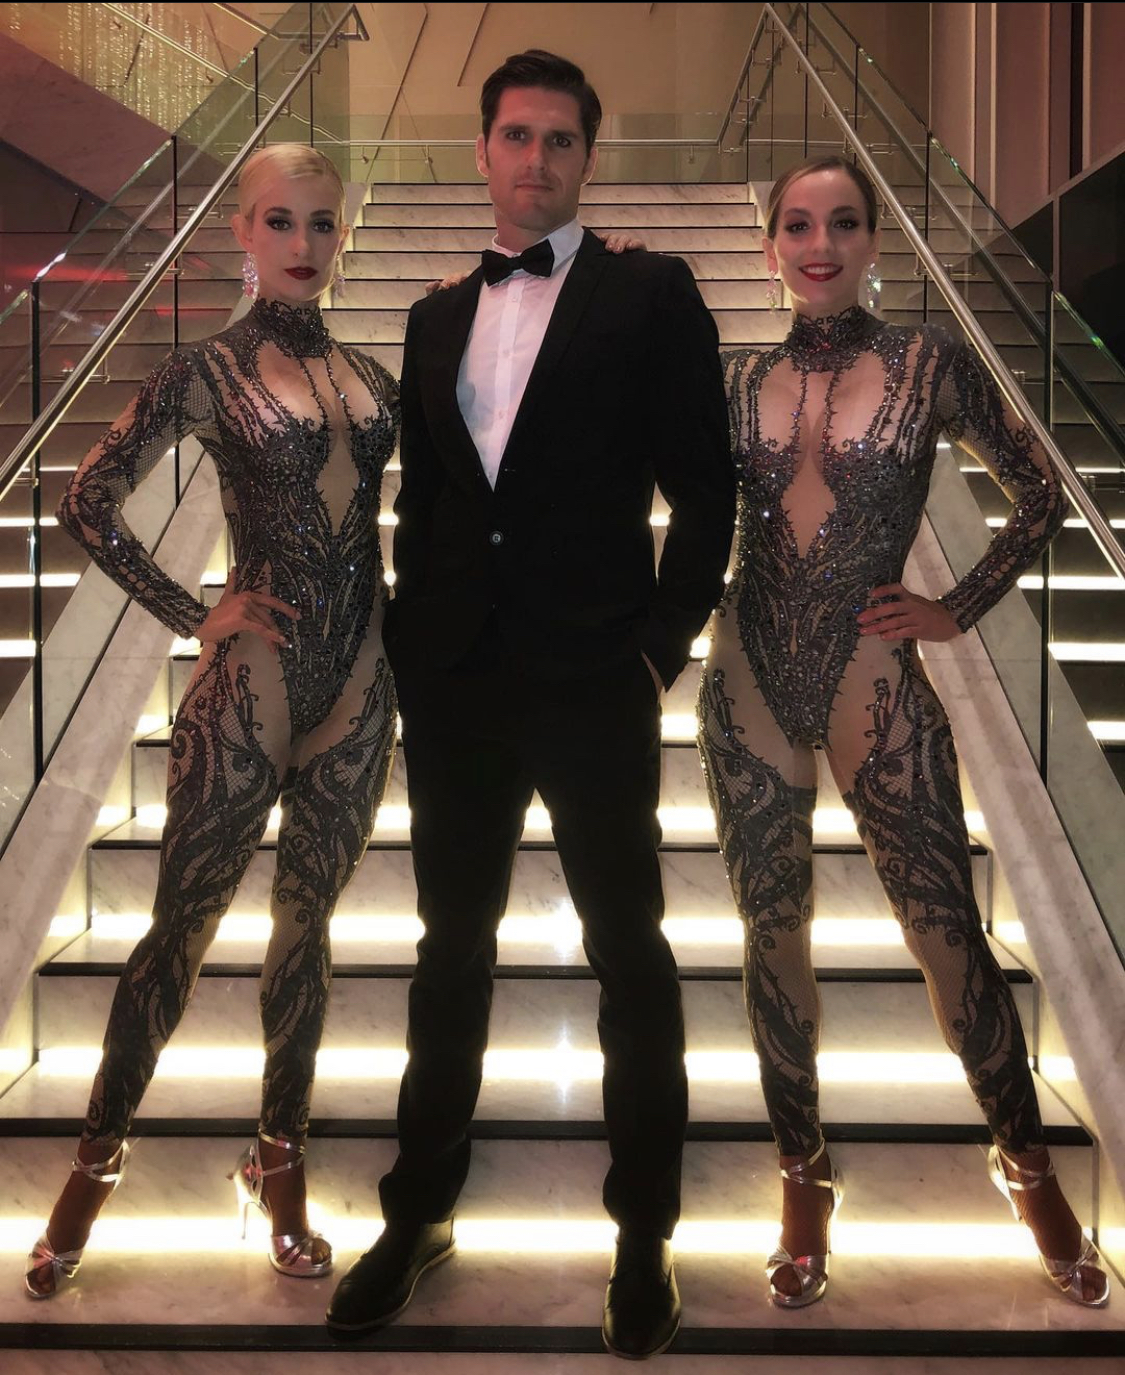 007 James Bond theme Dance Show